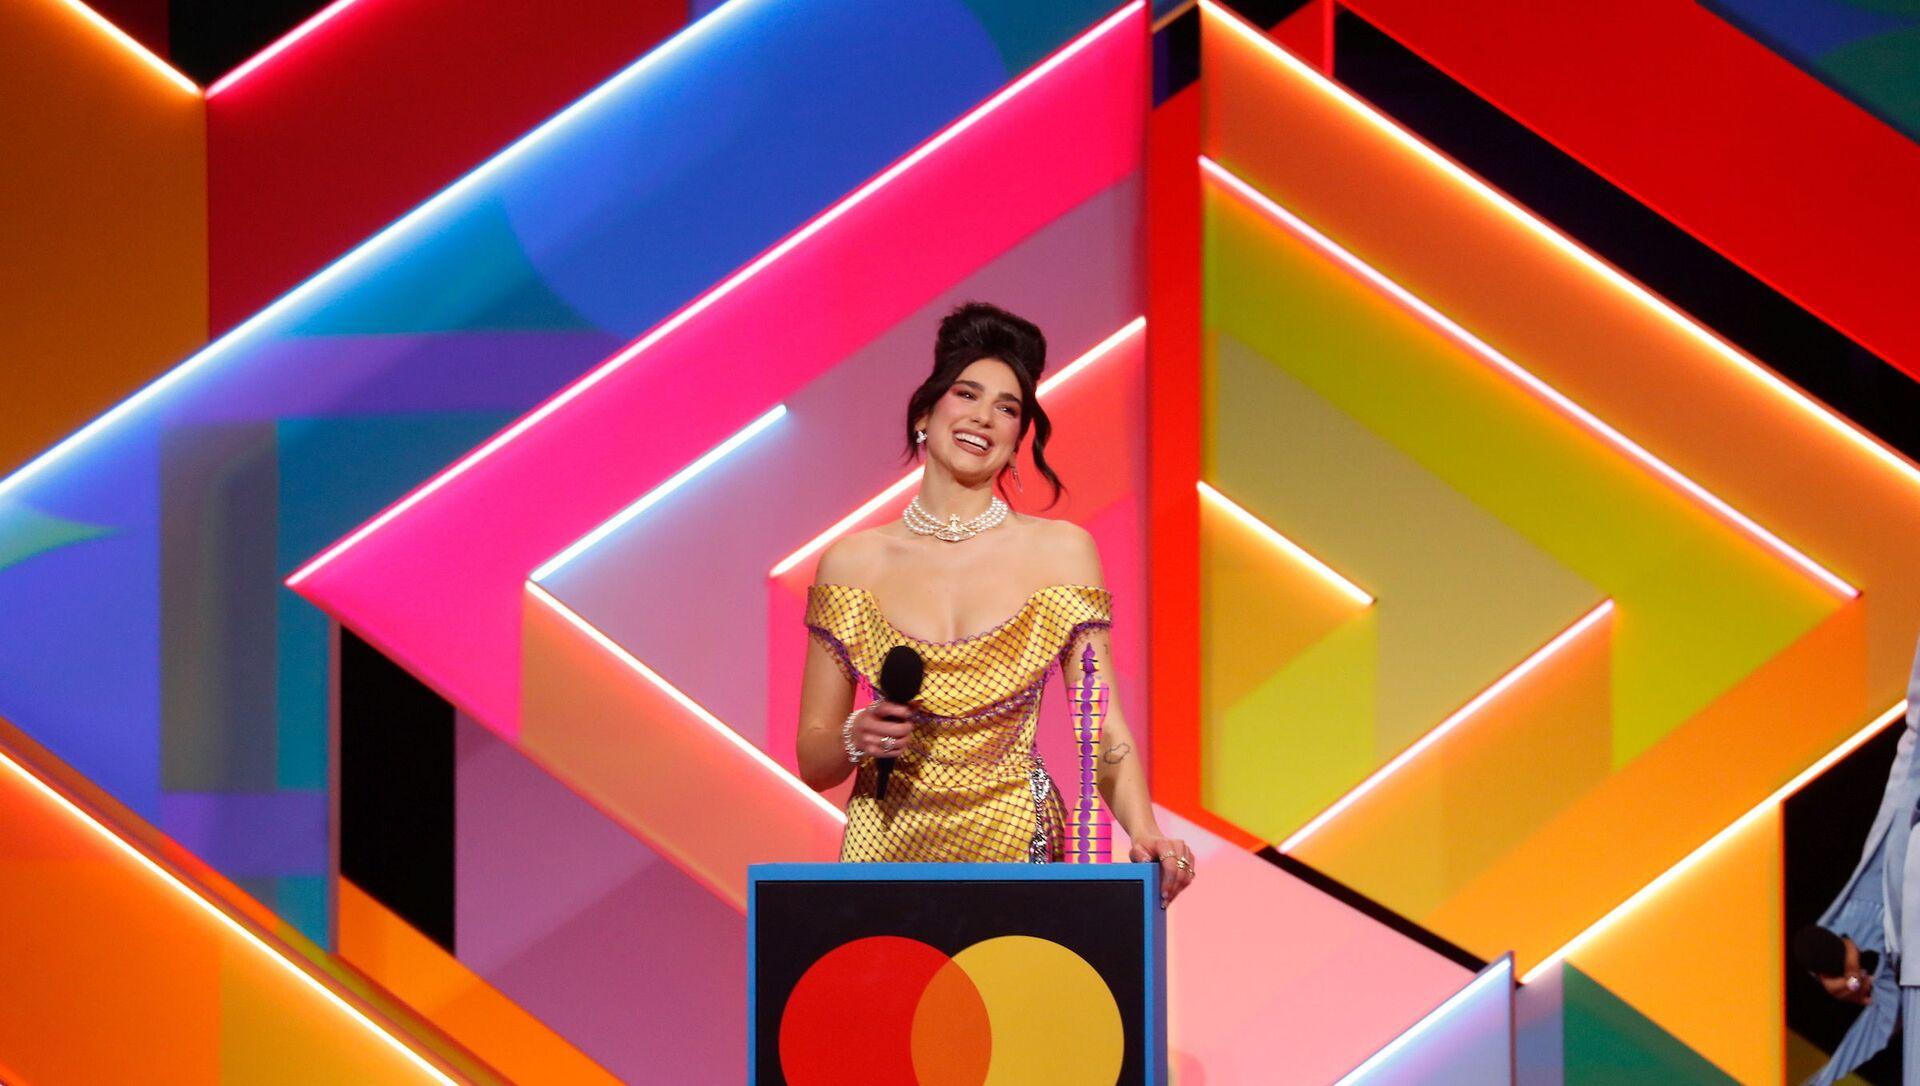 Дуа Липа на BRIT Awards - Sputnik Беларусь, 1920, 12.05.2021